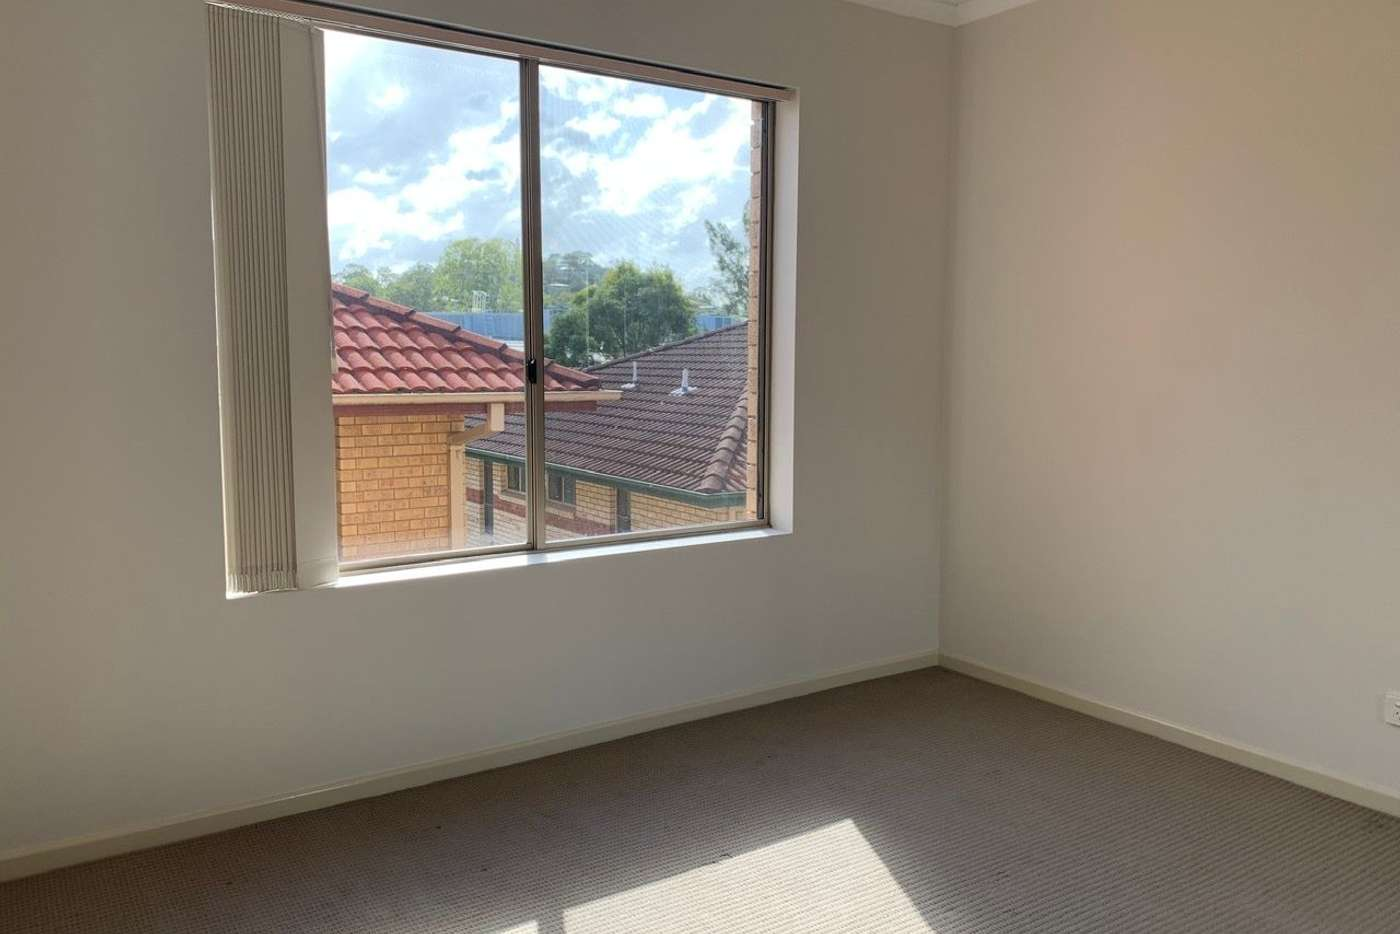 Sixth view of Homely unit listing, 5/21 Rise Street, Mount Gravatt East QLD 4122